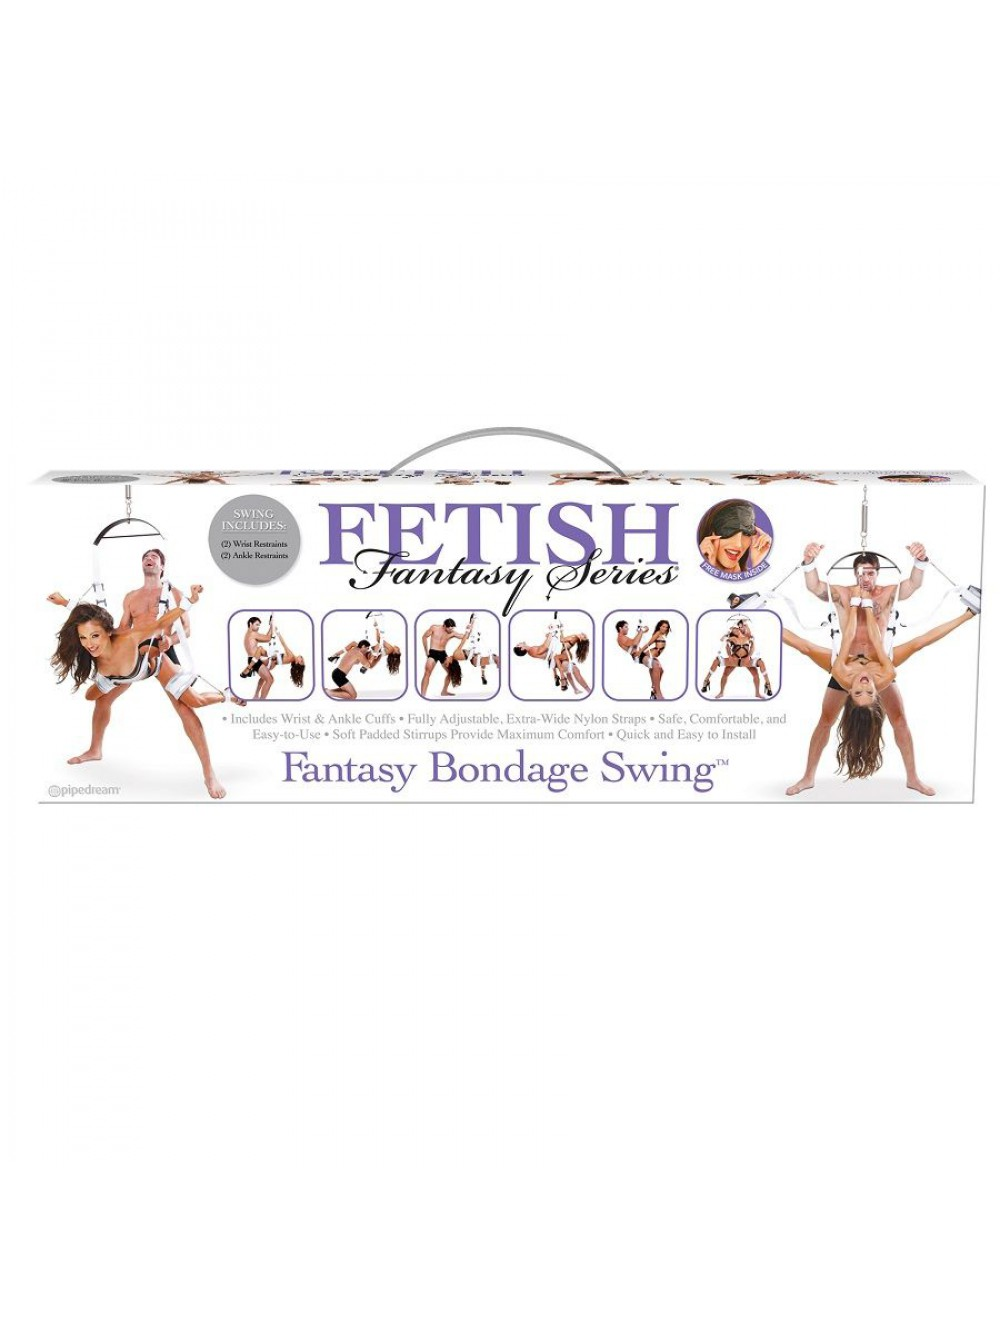 FETISH FANTASY FANTASY BONDAGE SWING 603912309577